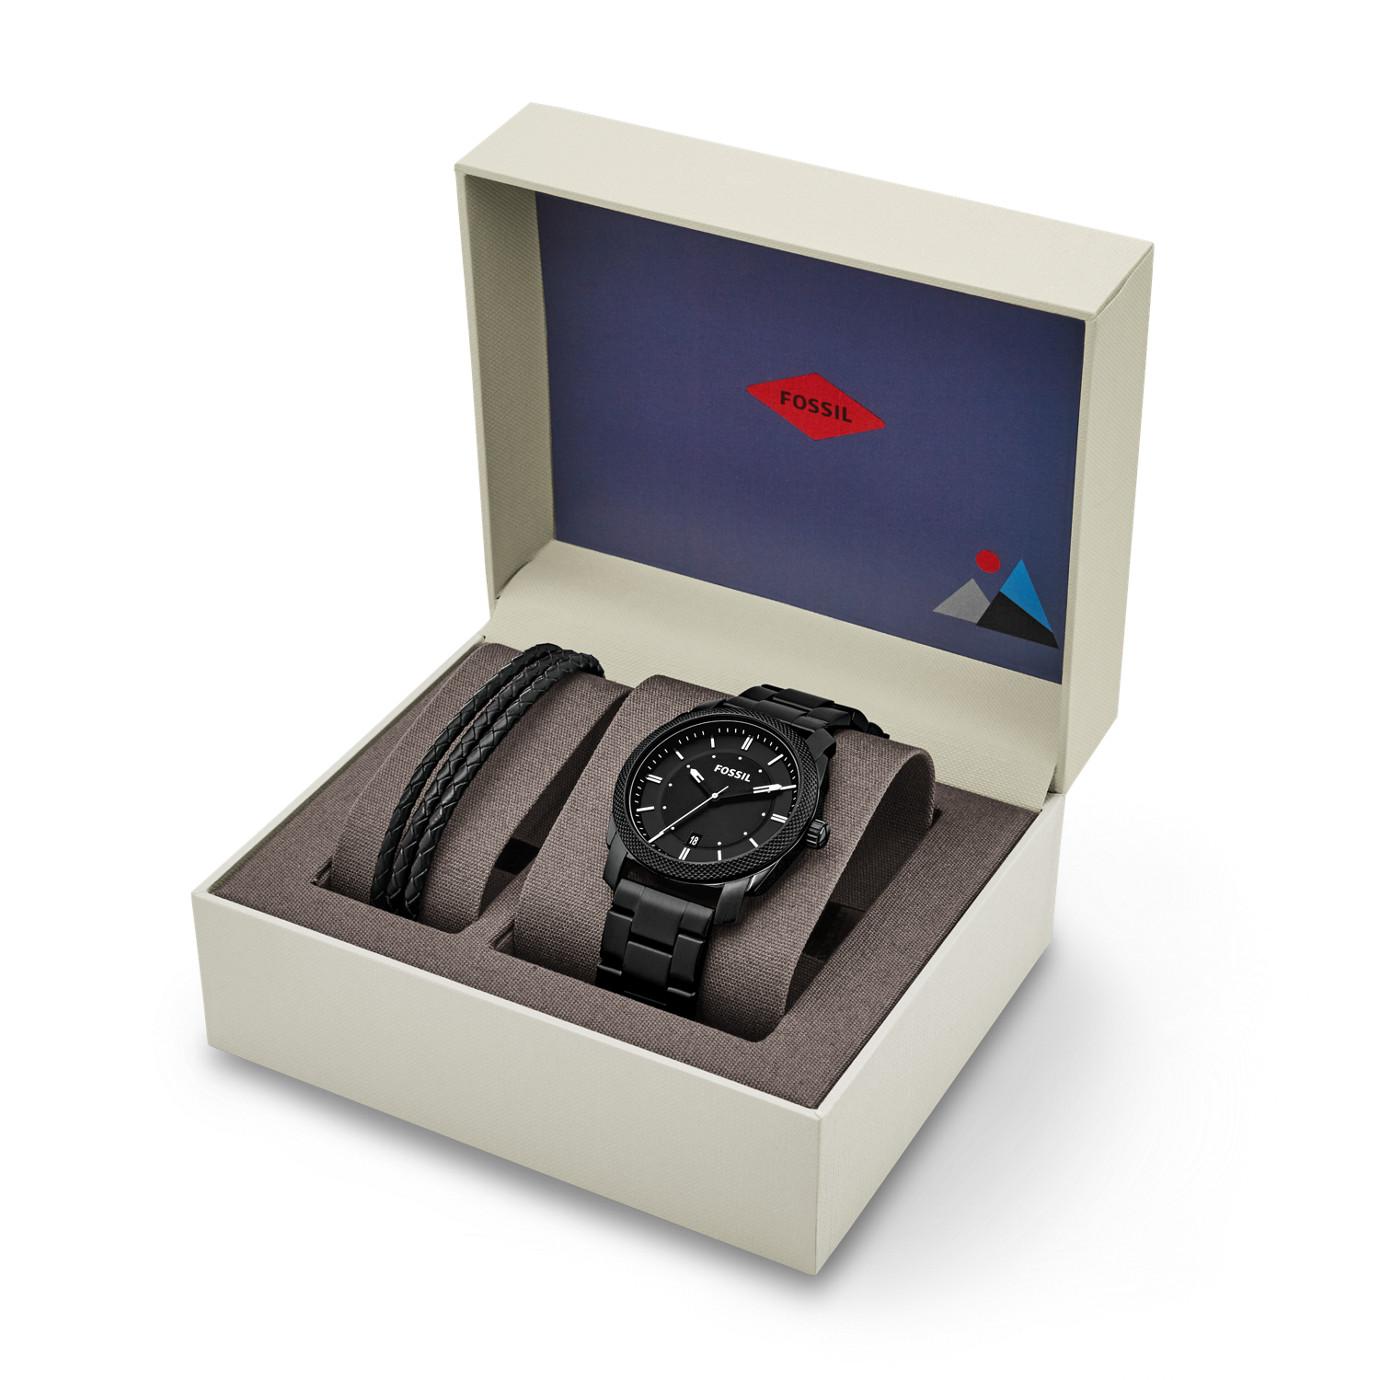 Machine ThreeHand Date Black Stainless Steel Watch and Jewelry Box